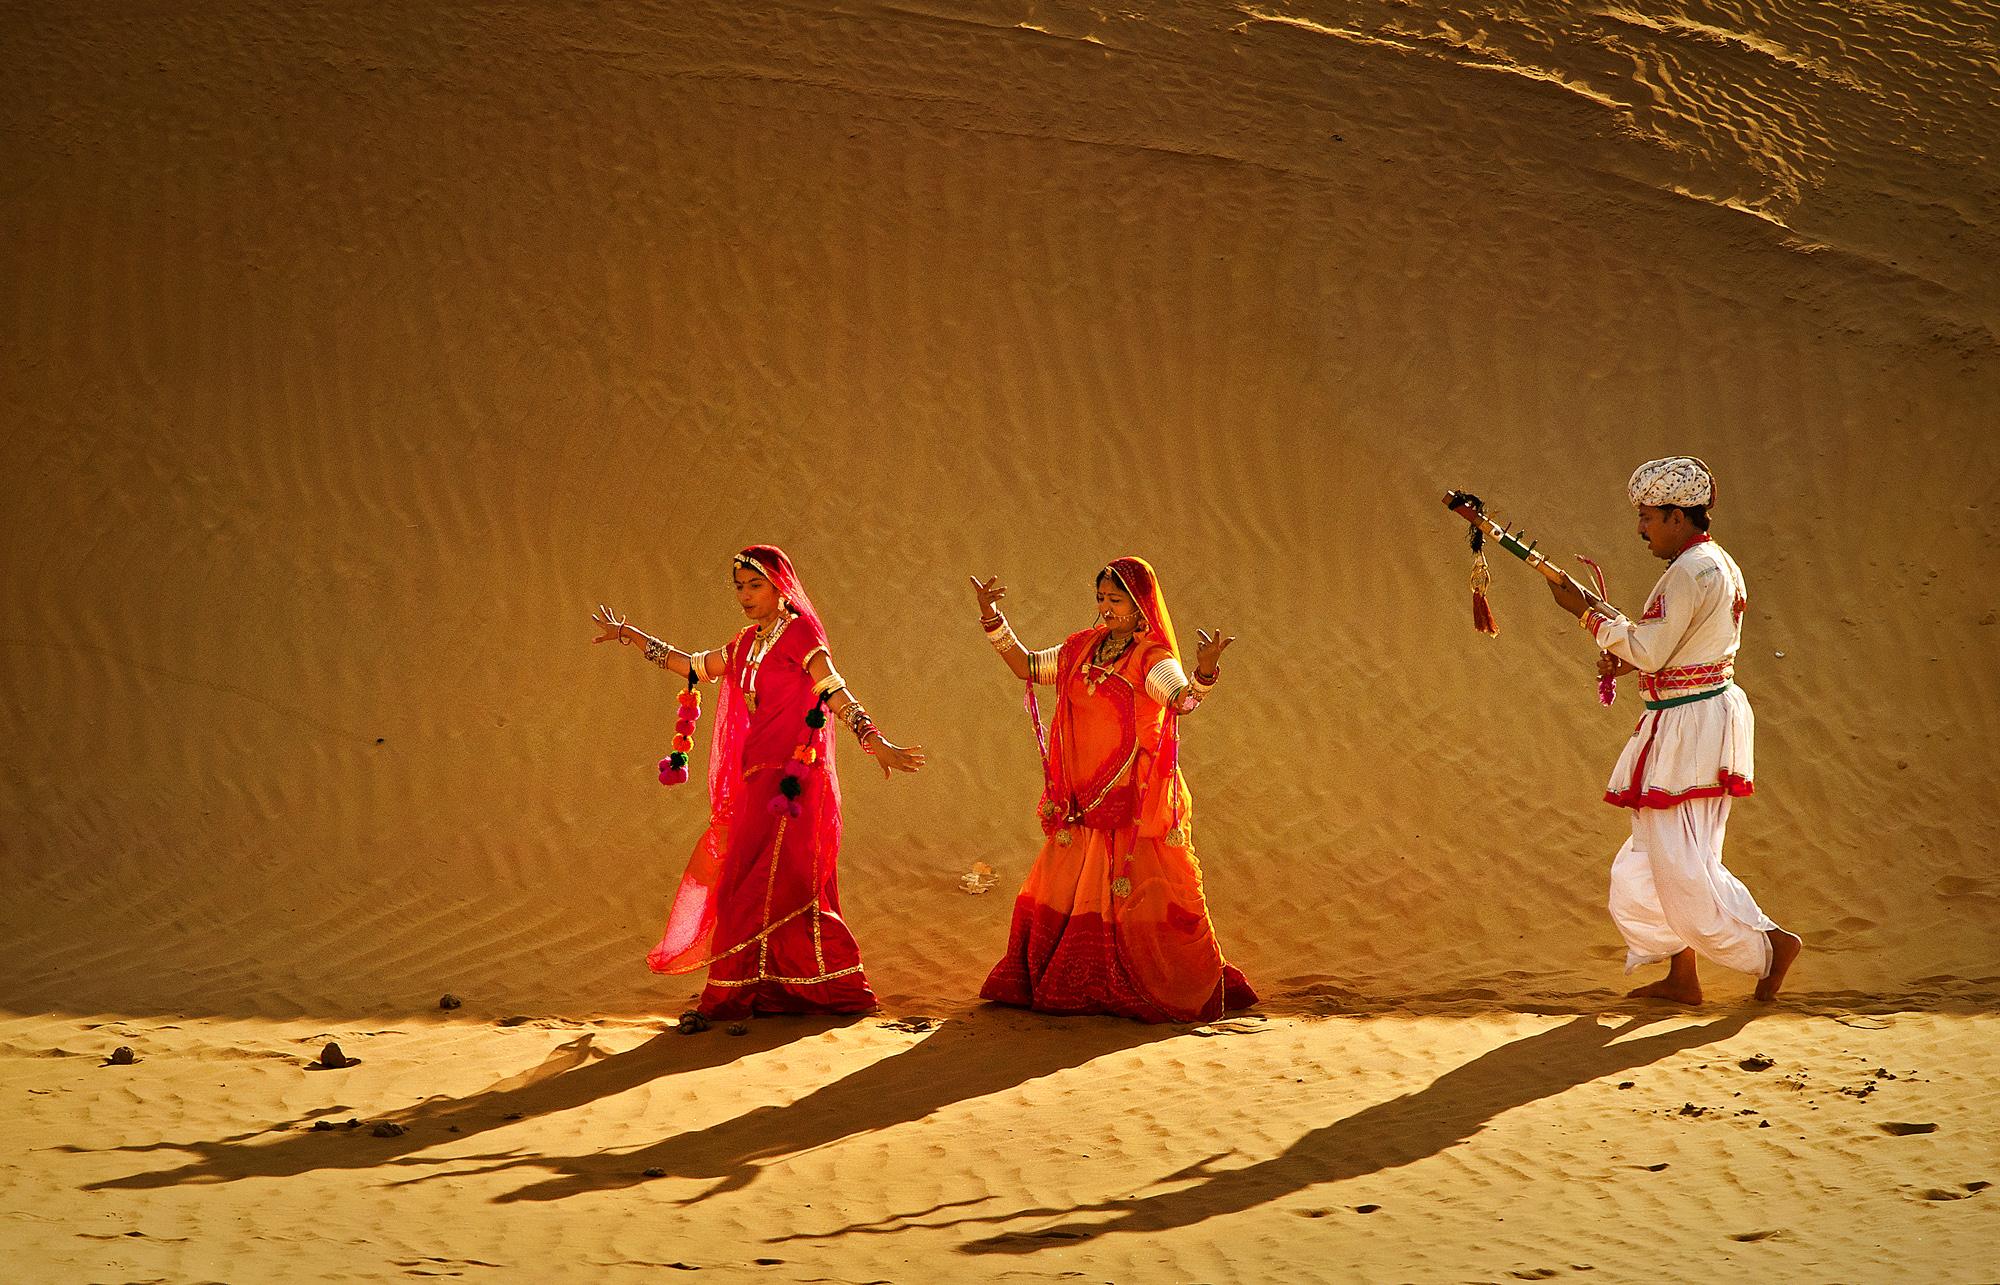 Tunes in Dunes, Rajasthan, India